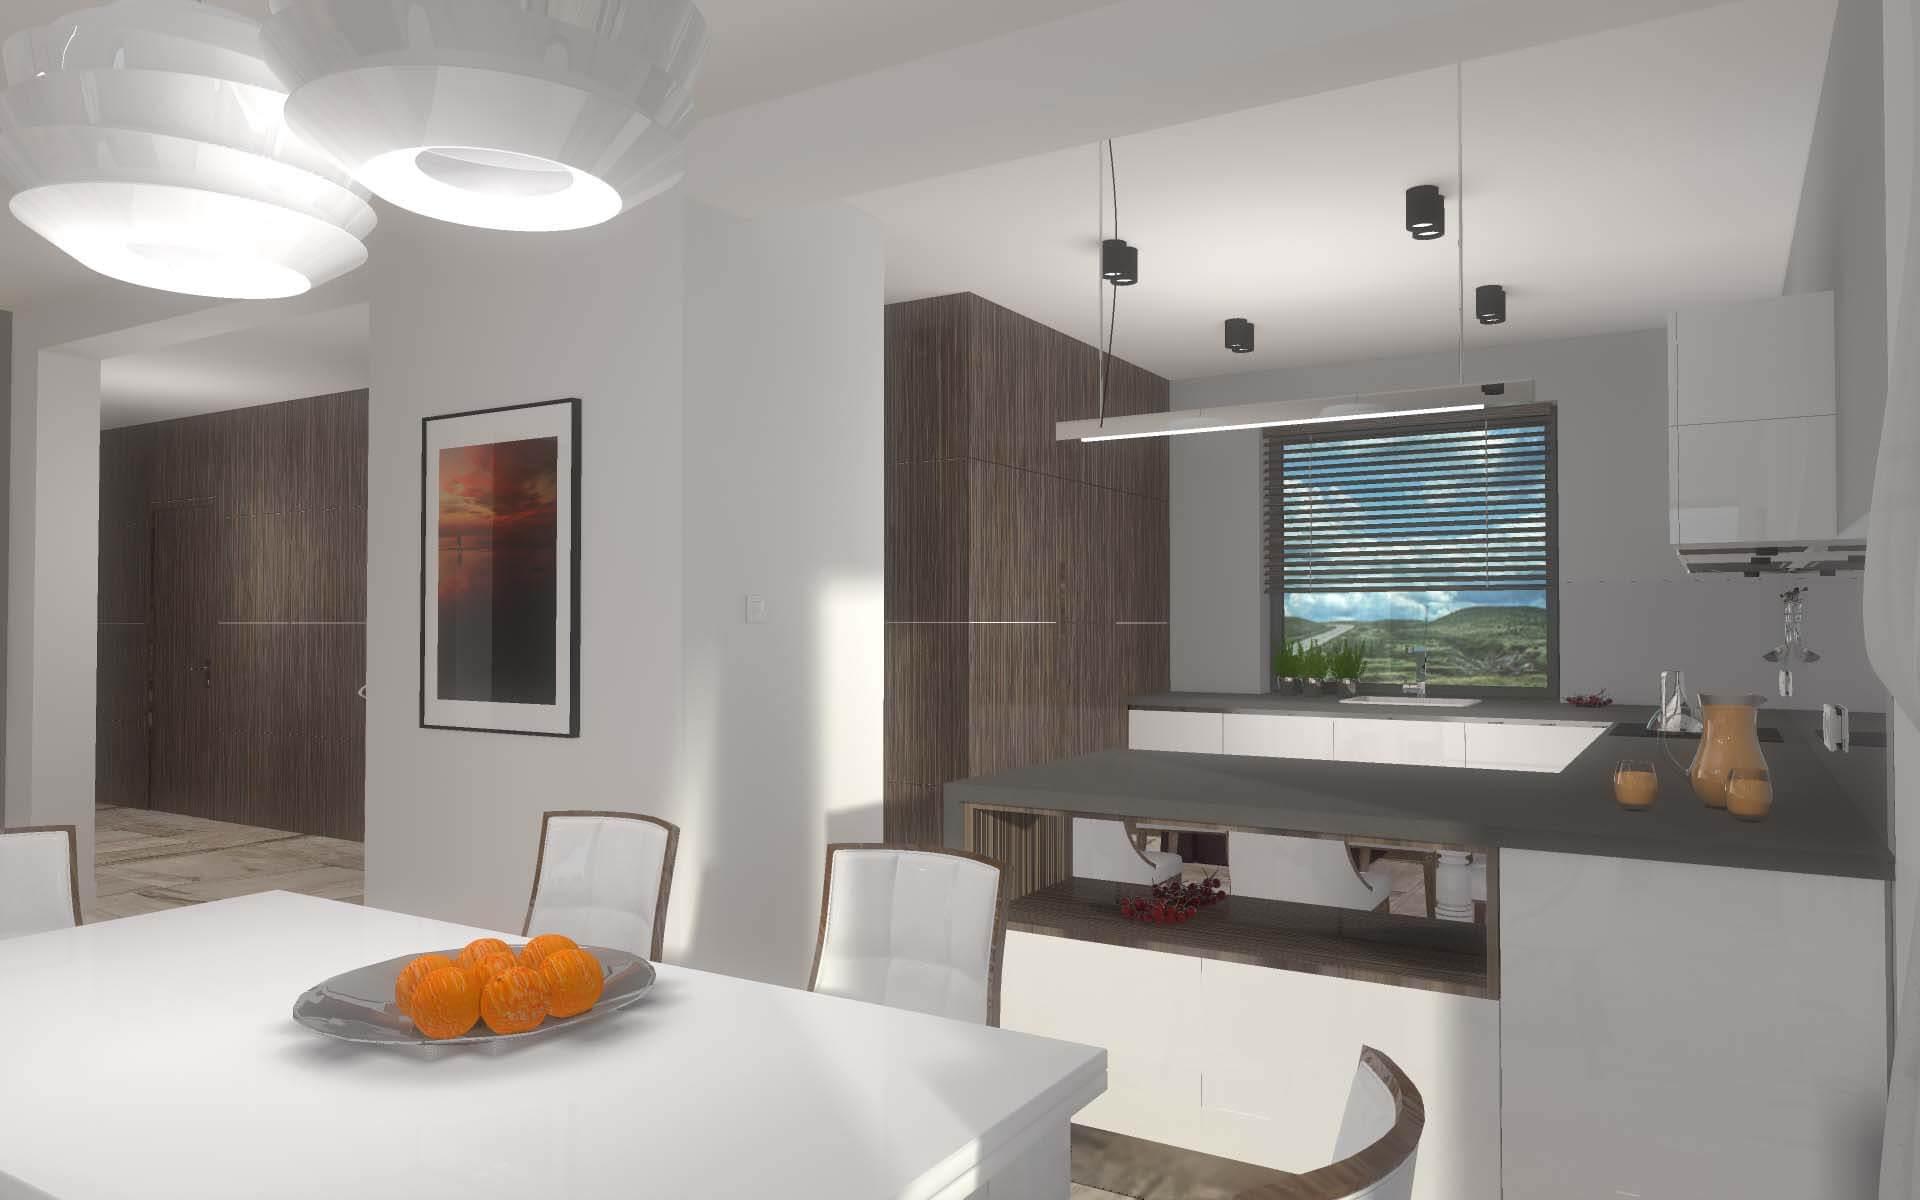 Projekt eleganckiej kuchni otwartej na salon mobiliani for Projekty kuchni z salonem